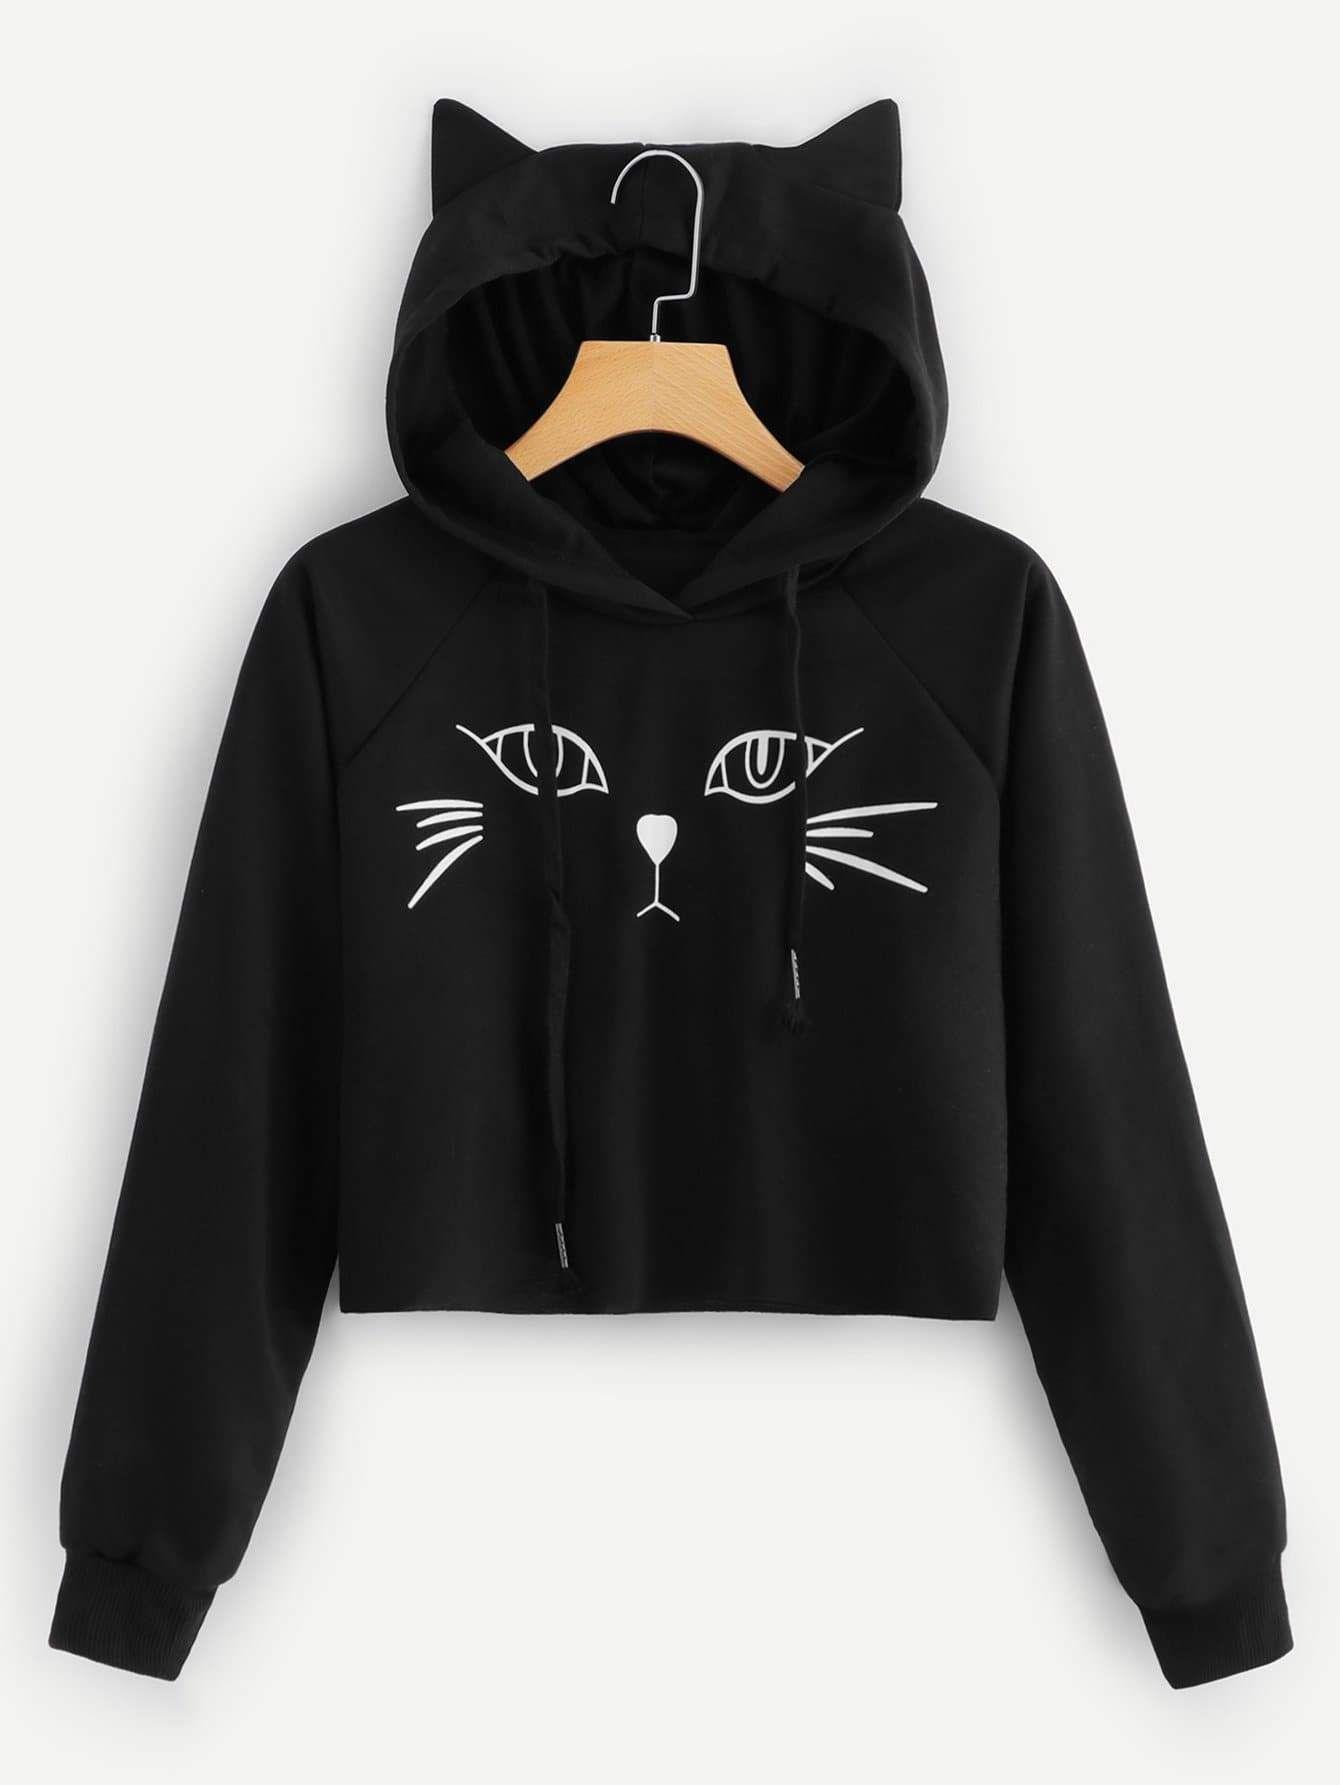 Photo of Black Cat Graphic Hooded Sweatshirt CS370427